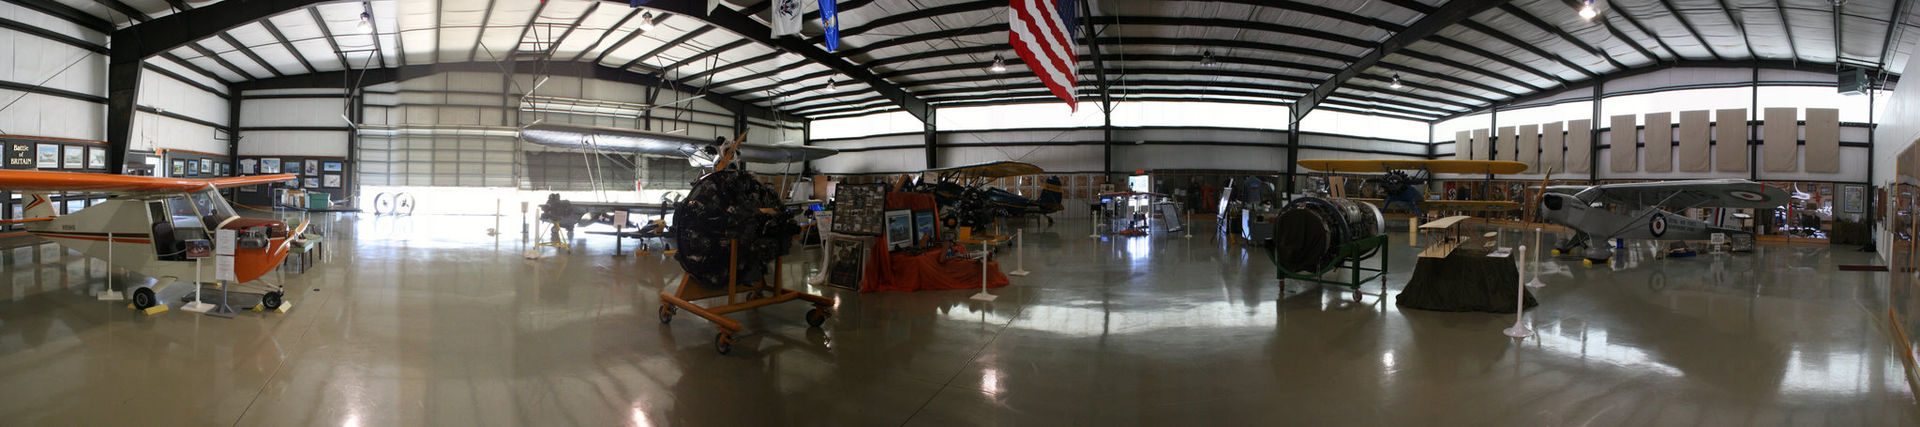 NCAM Hangar 1